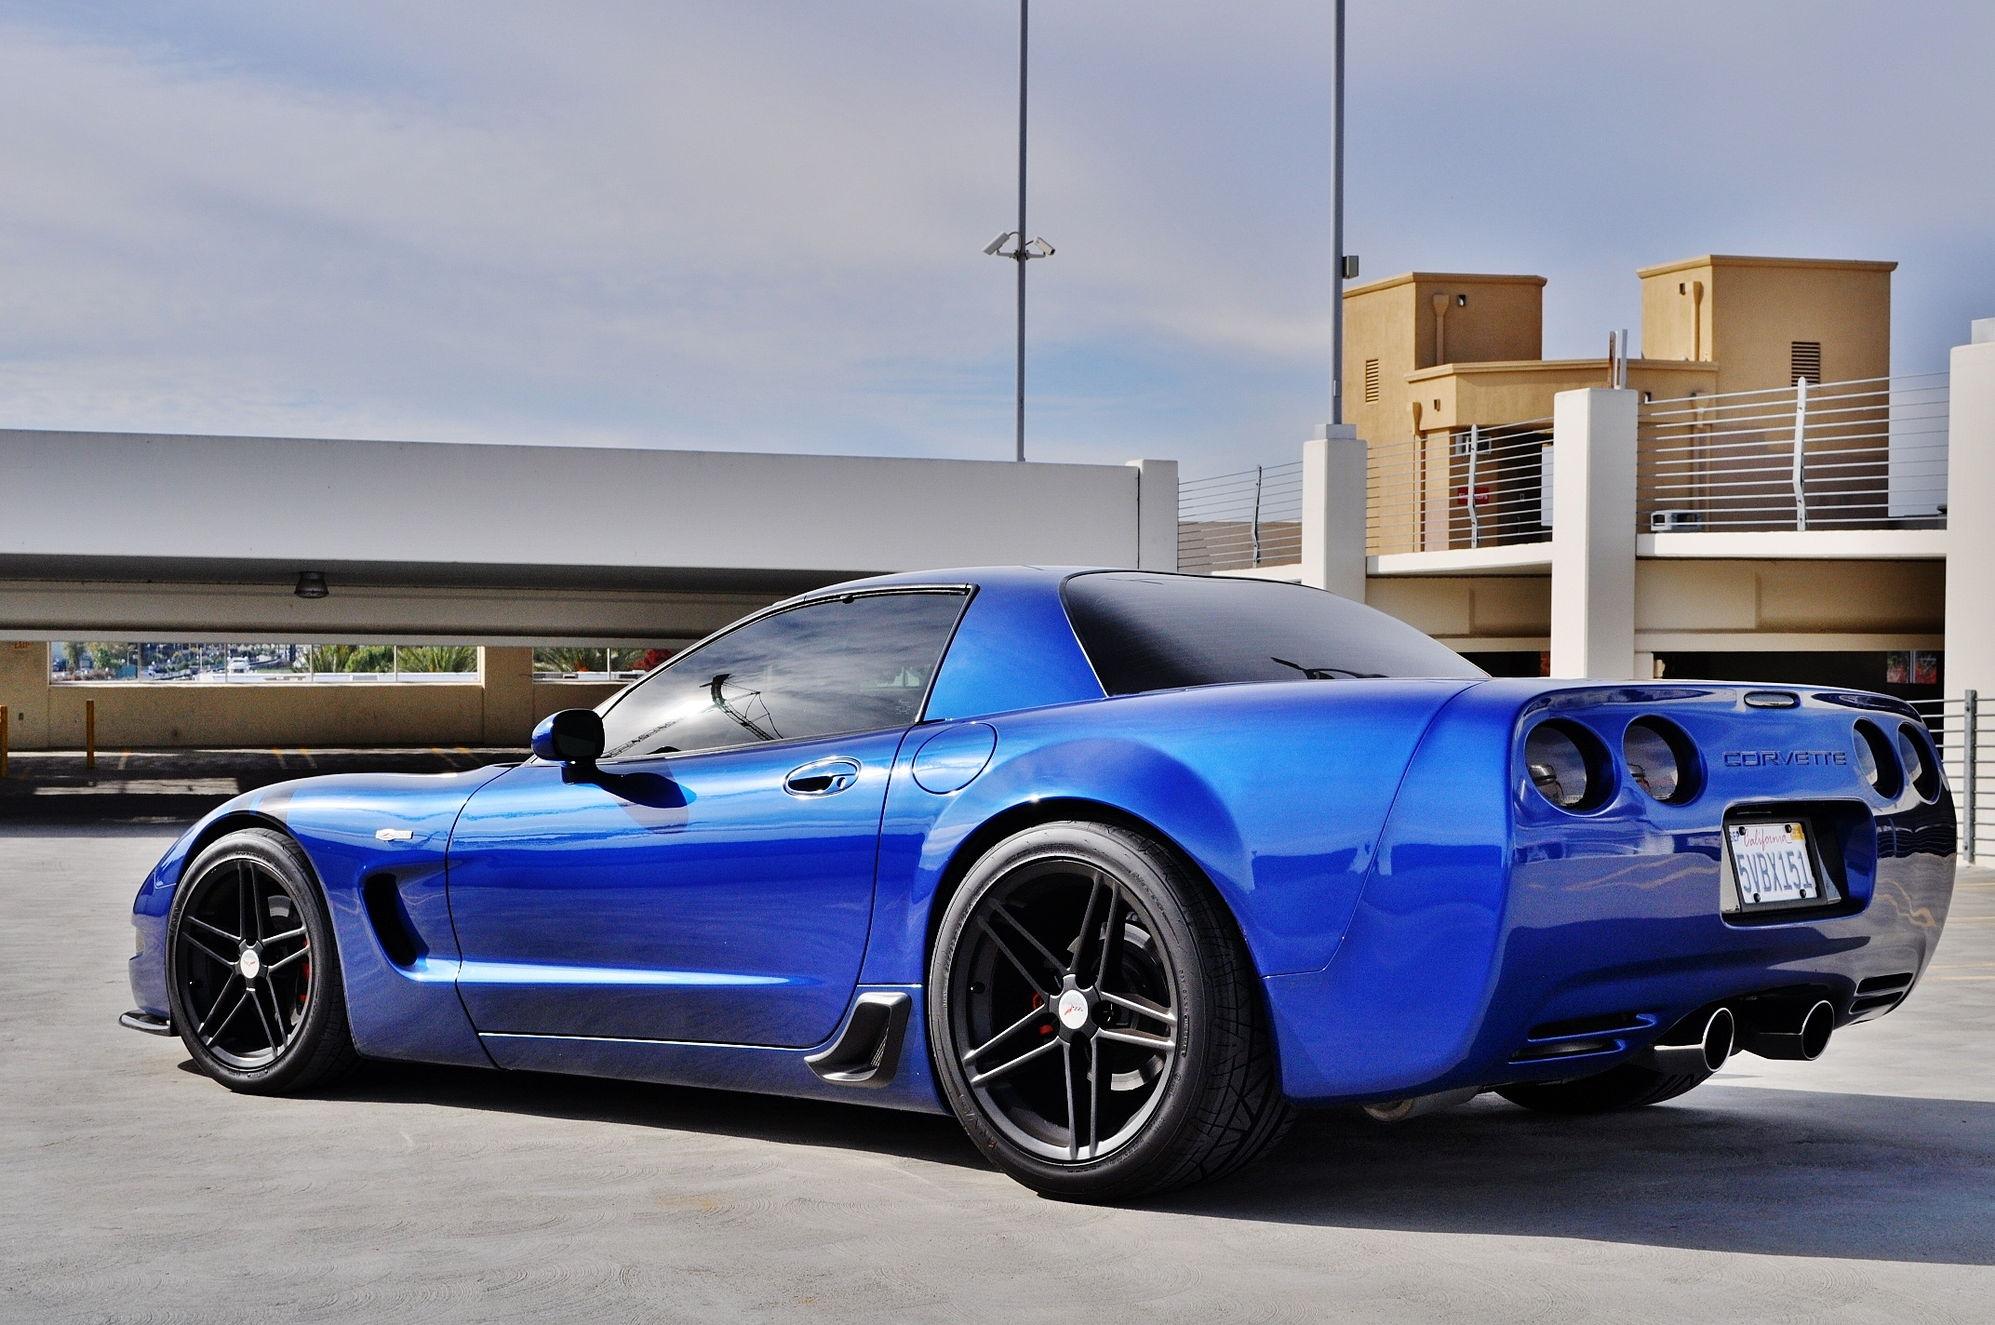 modified z06 corvettes for sale autos post. Black Bedroom Furniture Sets. Home Design Ideas